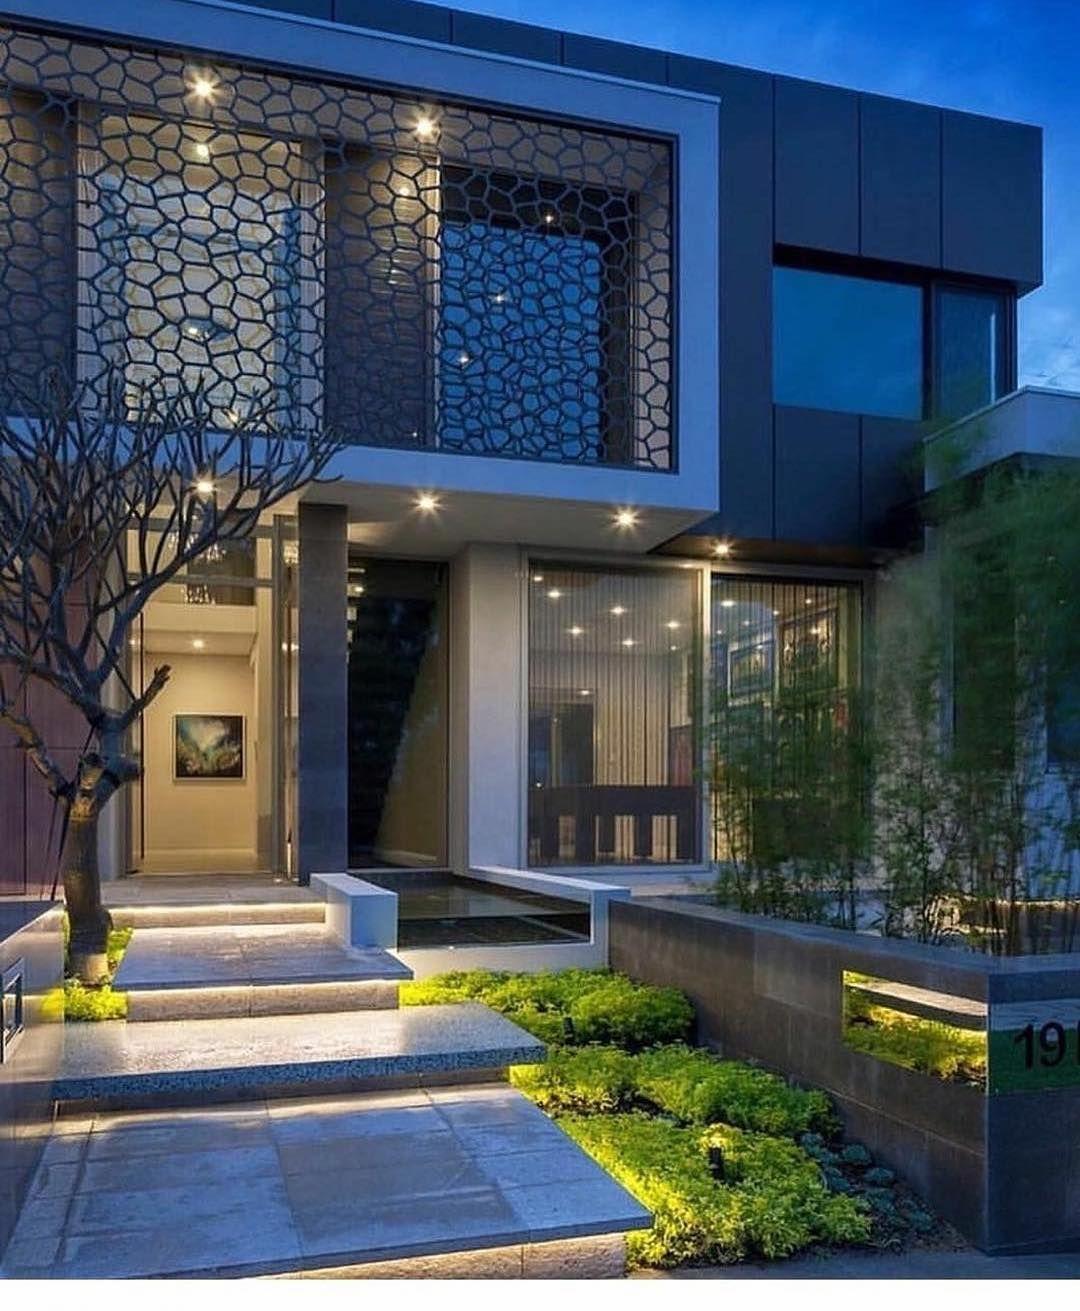 2040 me gusta 4 comentarios contemporary home contemporaryhome en instagram contemporary house by daniel lomma design australia greeneryhouse